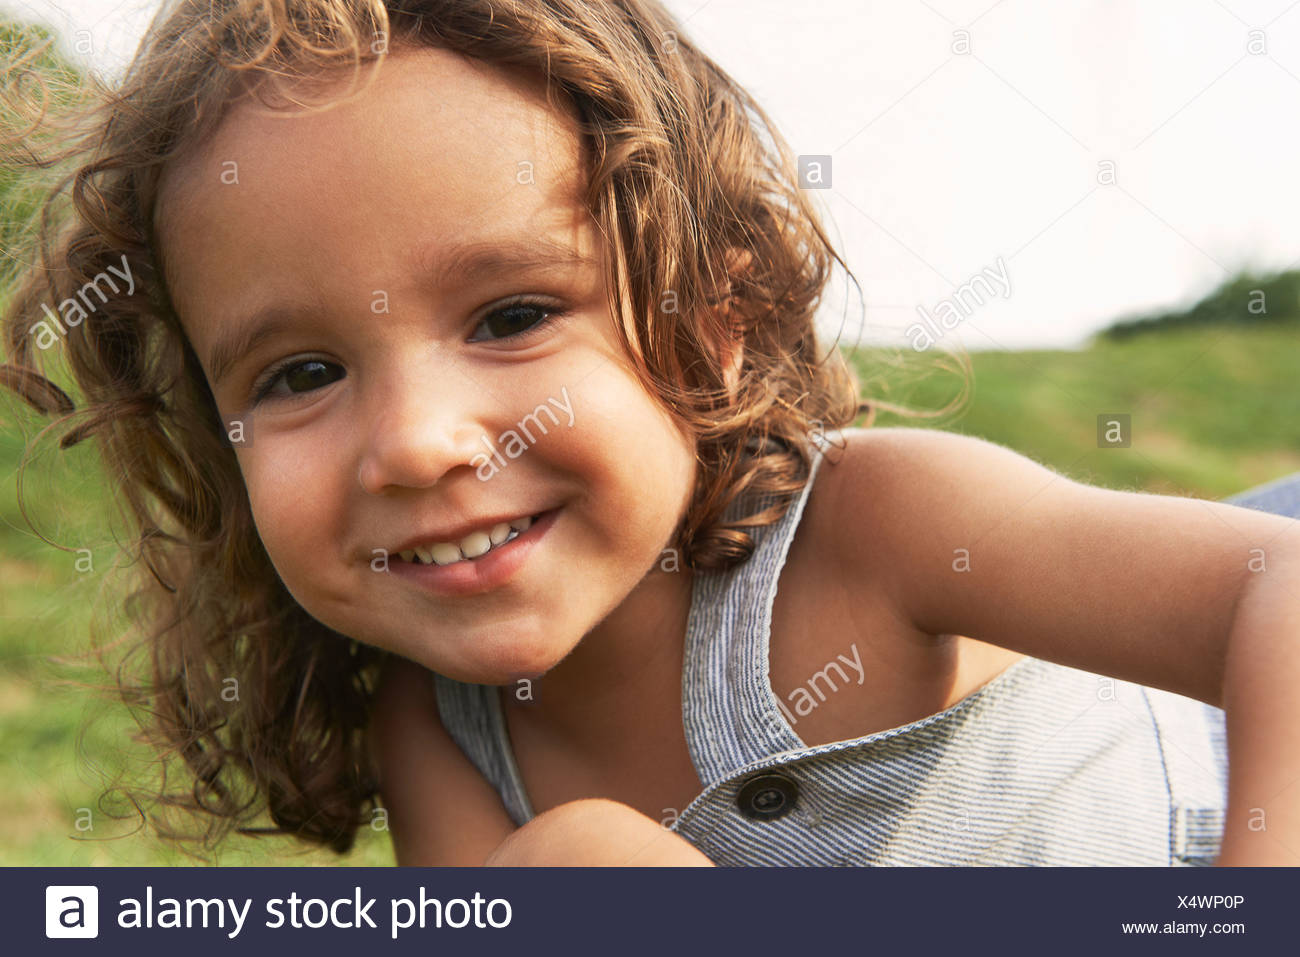 Porträt des jungen mit braunen Haaren, Lächeln Stockbild